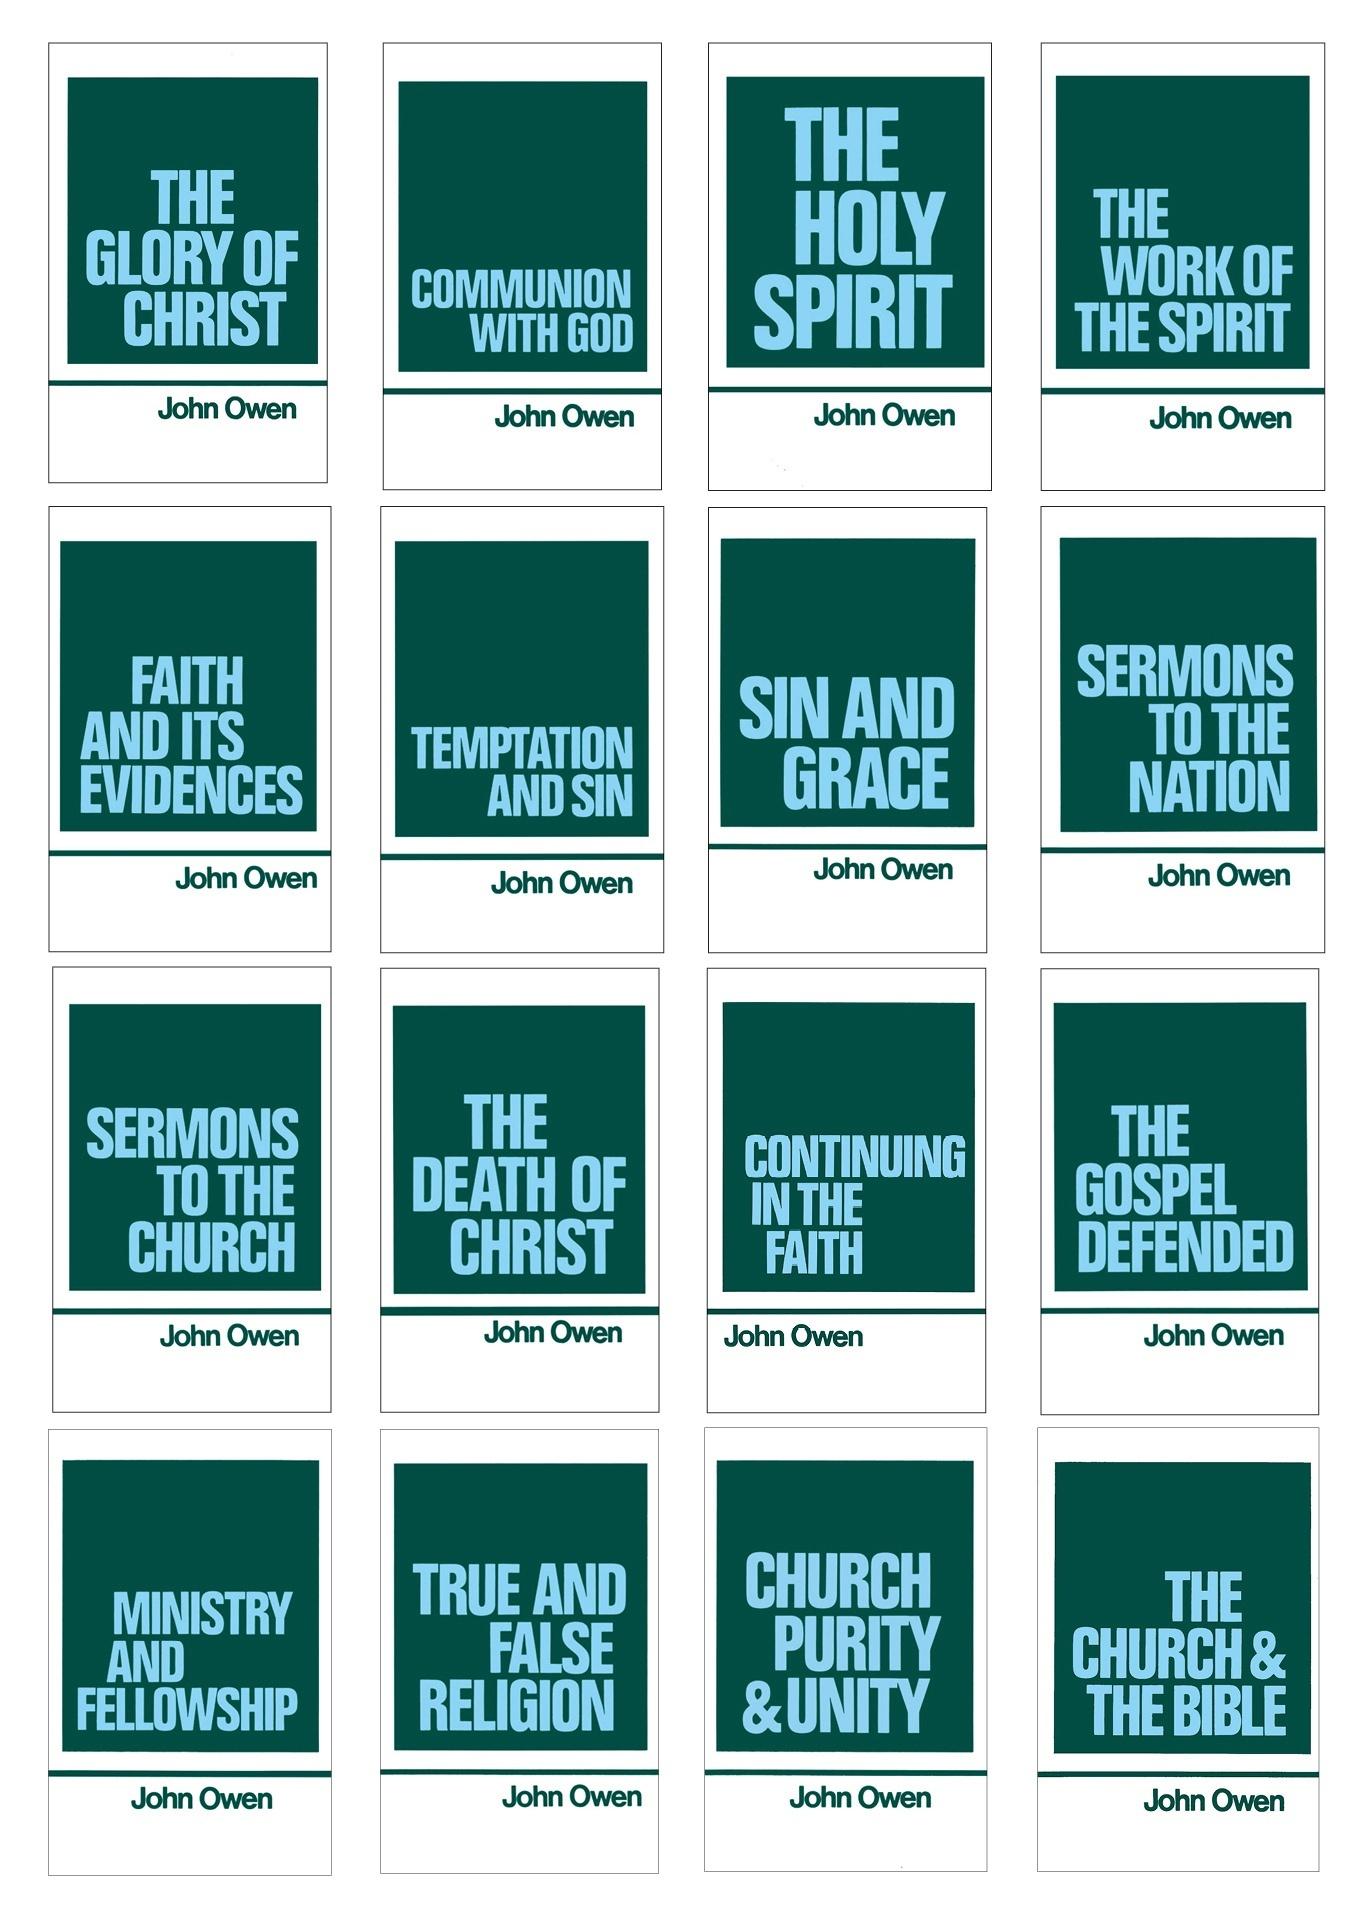 Image Credit: Banner of Truth Works of John Owen